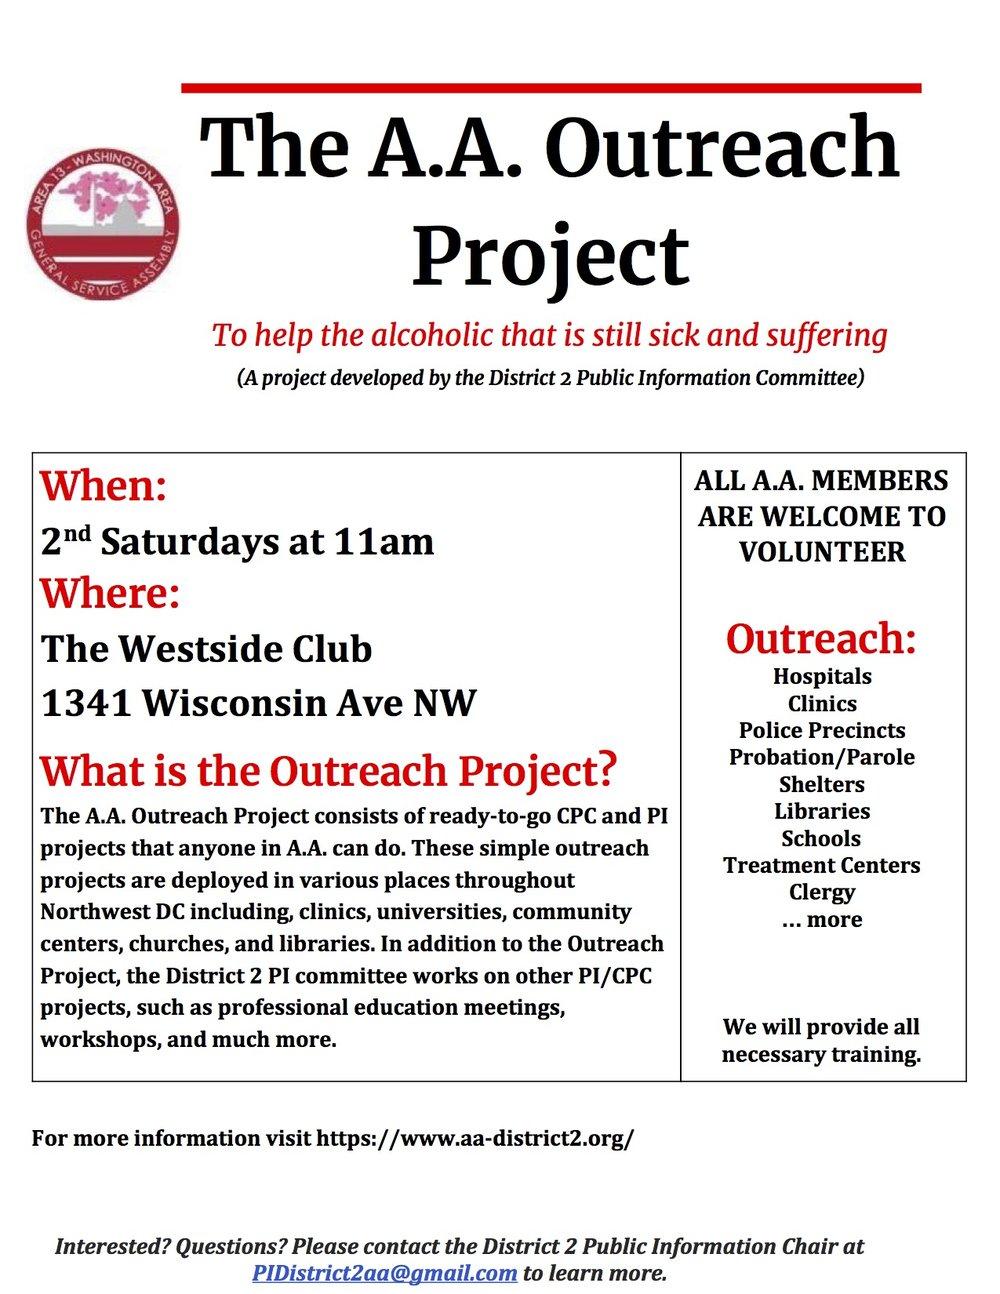 AA Outreach Project Flyer.jpg